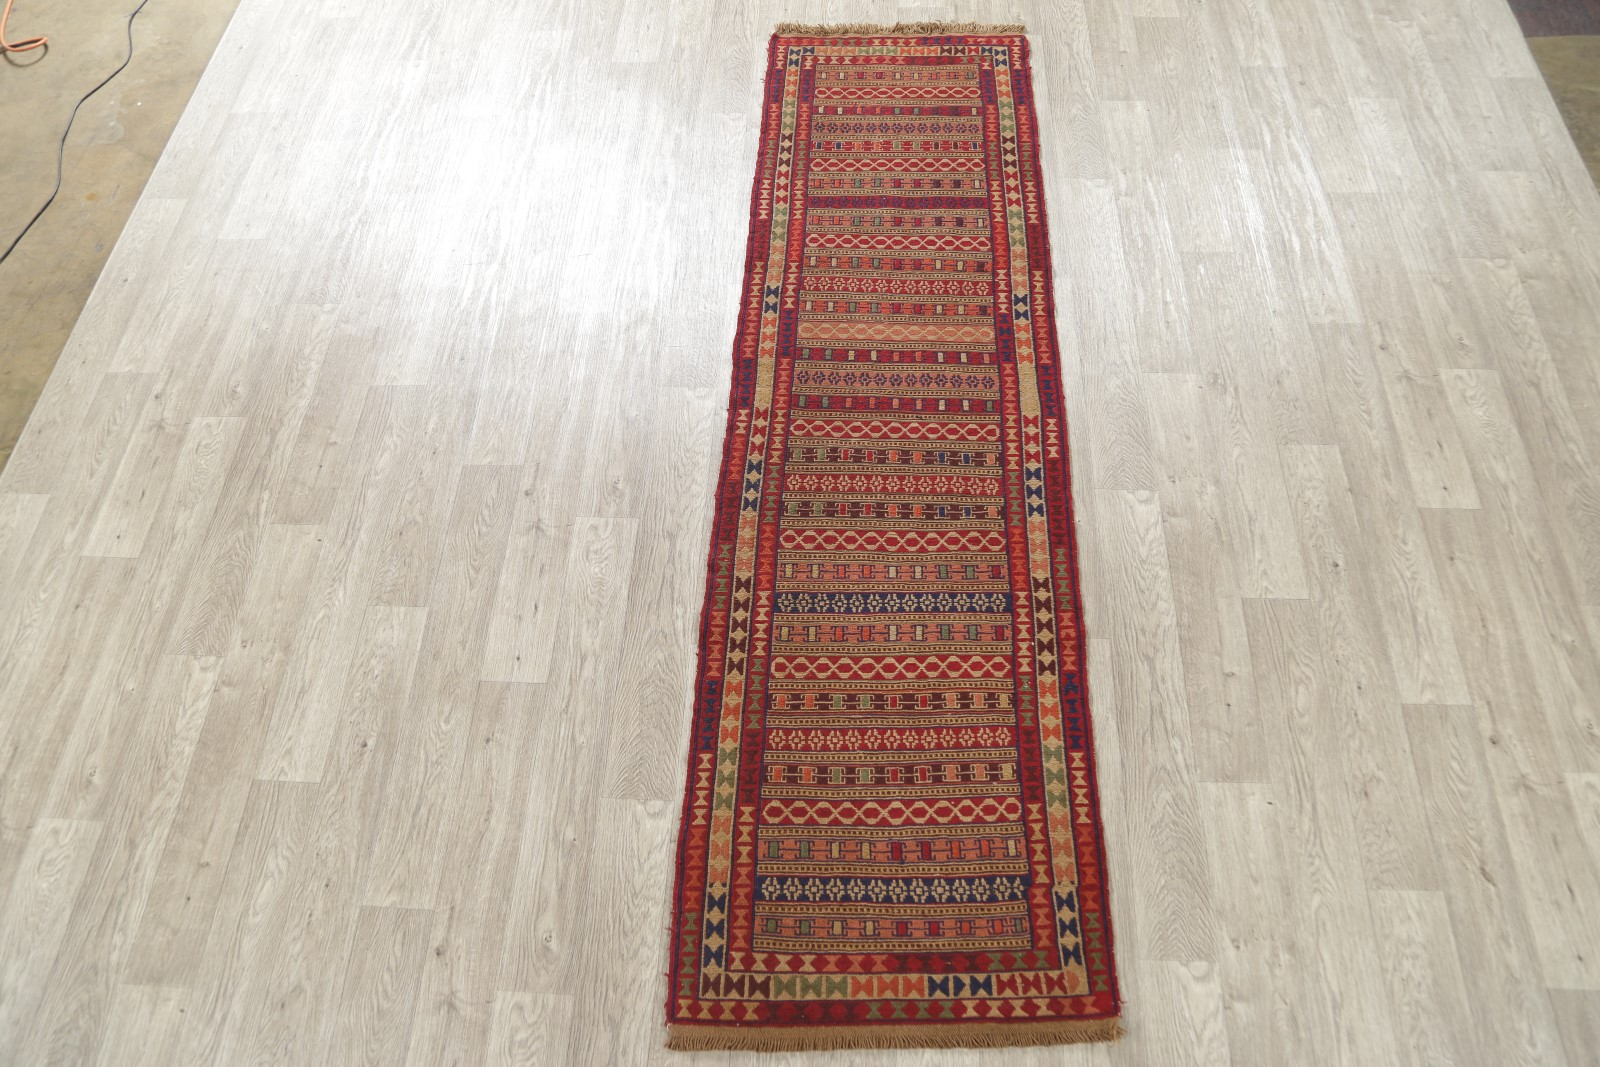 New Fine Handmade Geometric Wool Kilim Oriental Runner Rug 3x9 Ebay